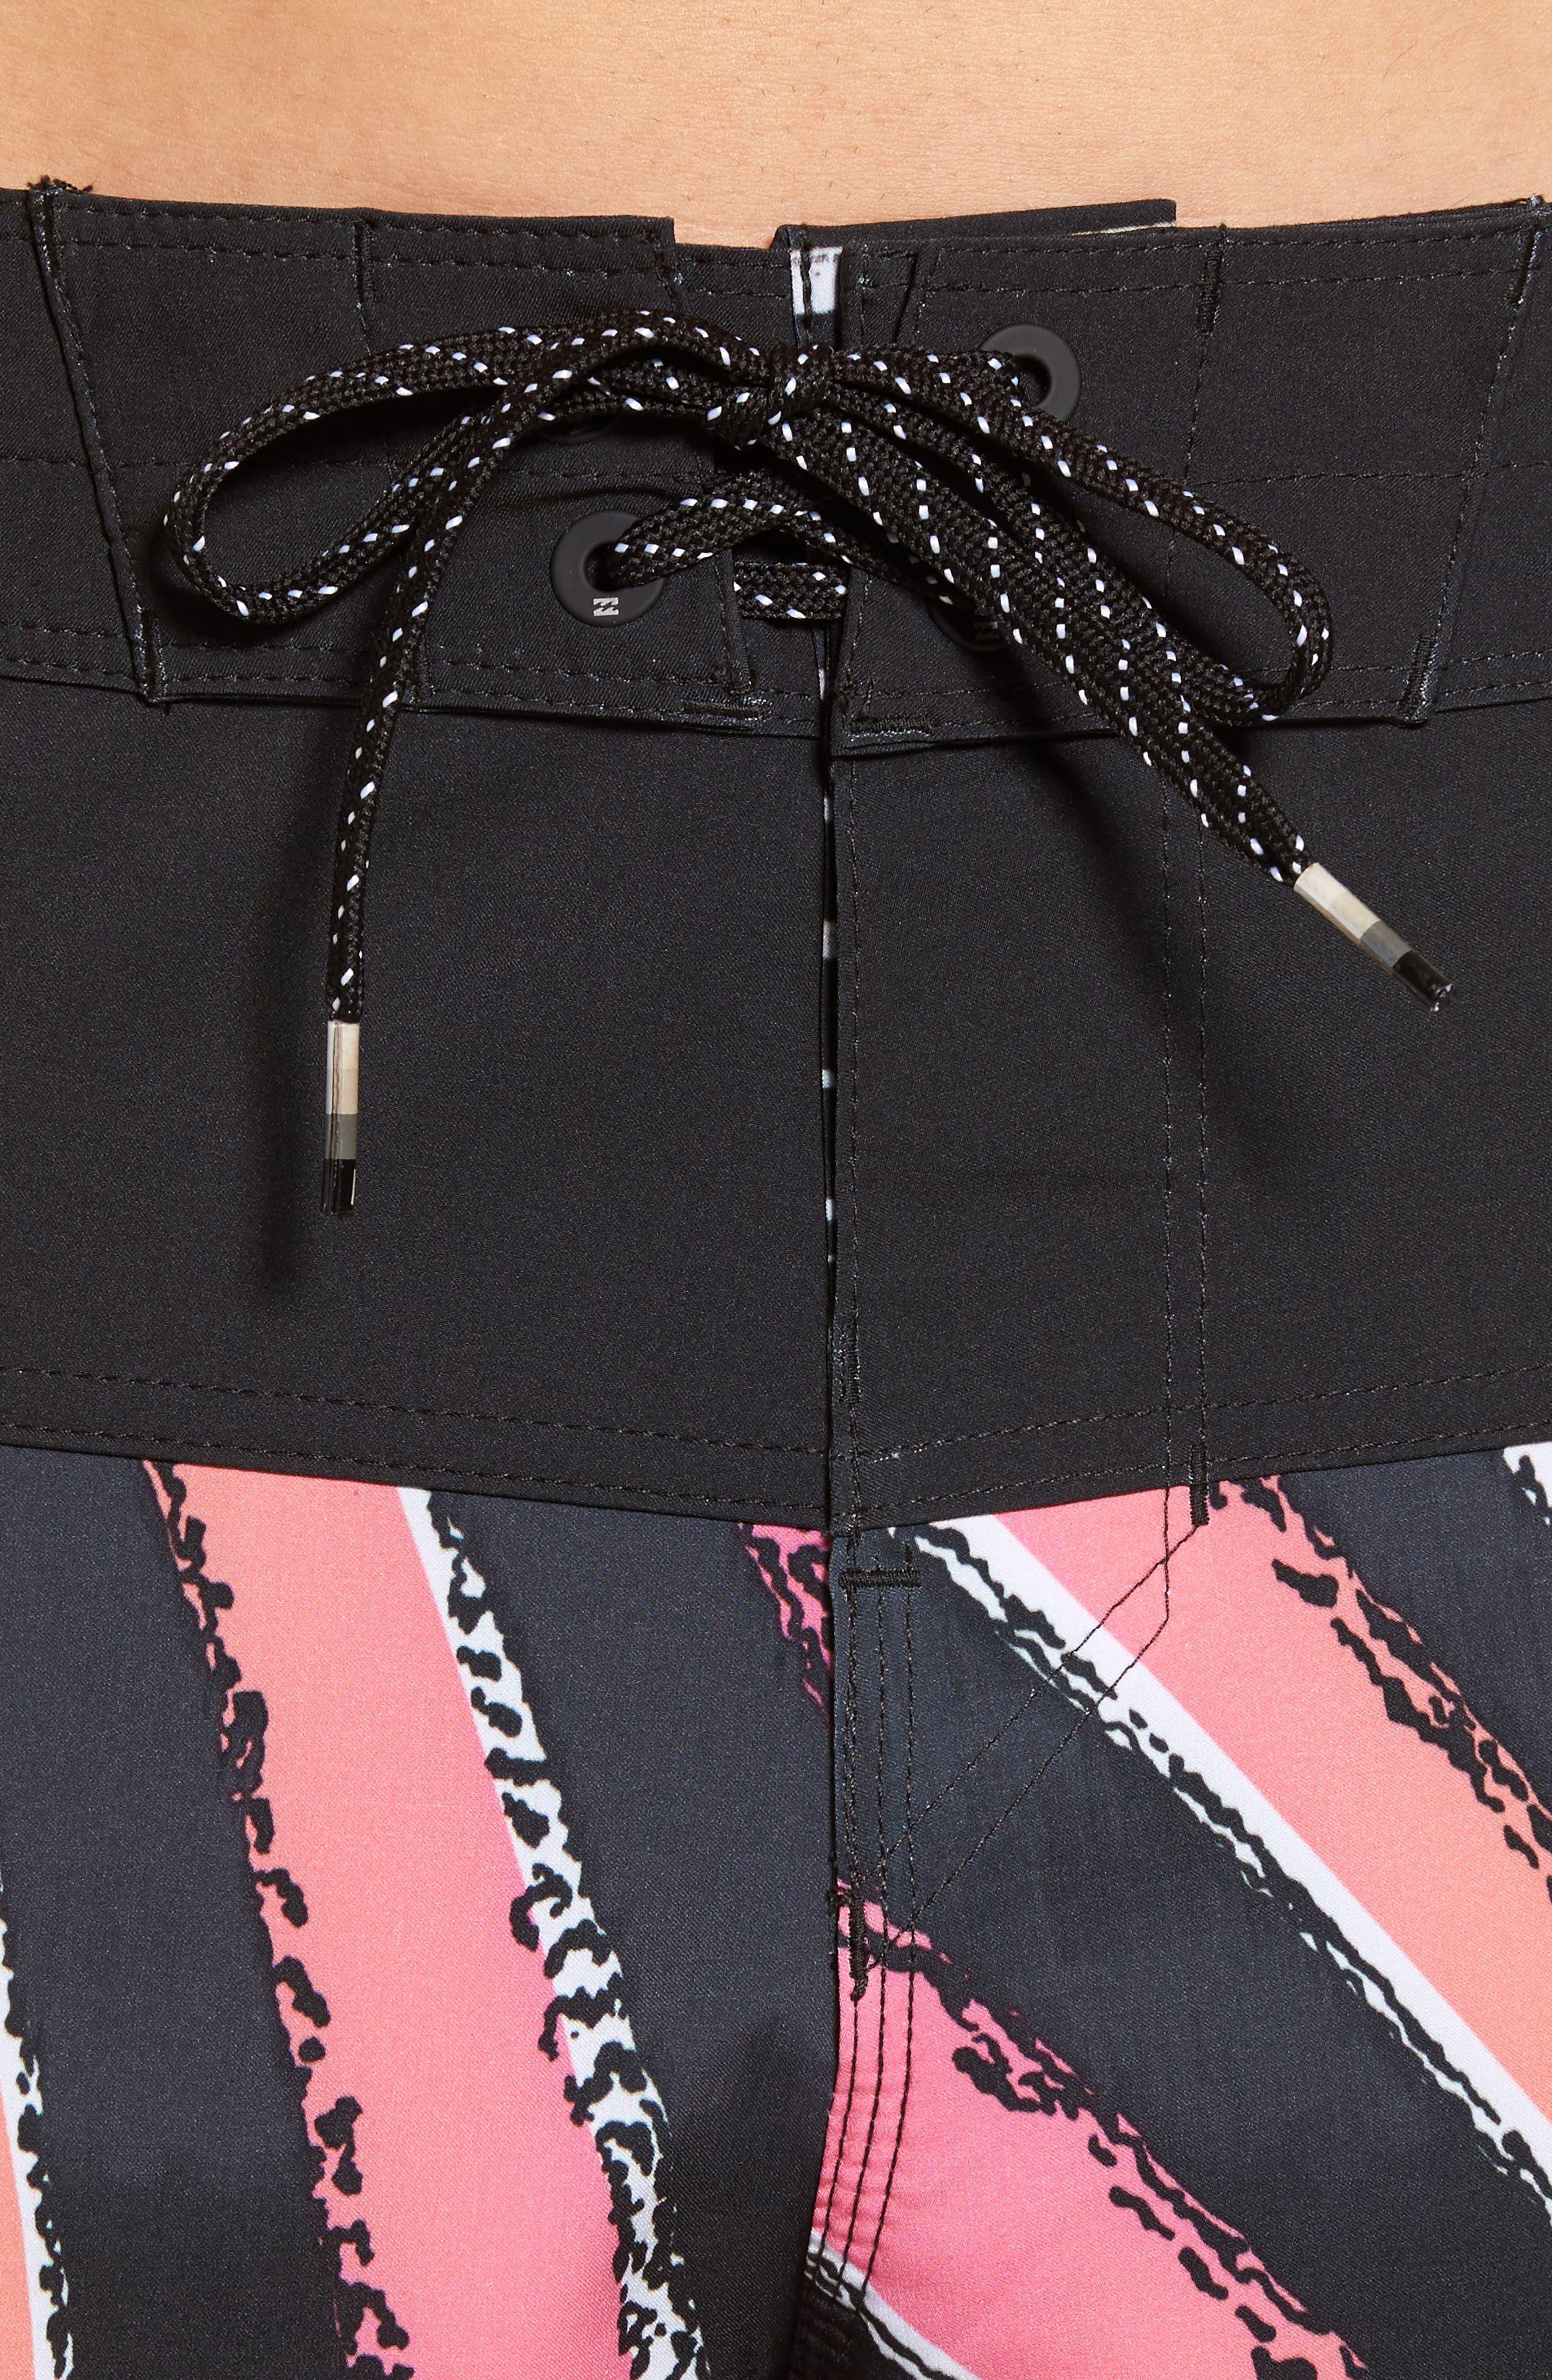 Tribong X Board Shorts,                             Alternate thumbnail 4, color,                             001